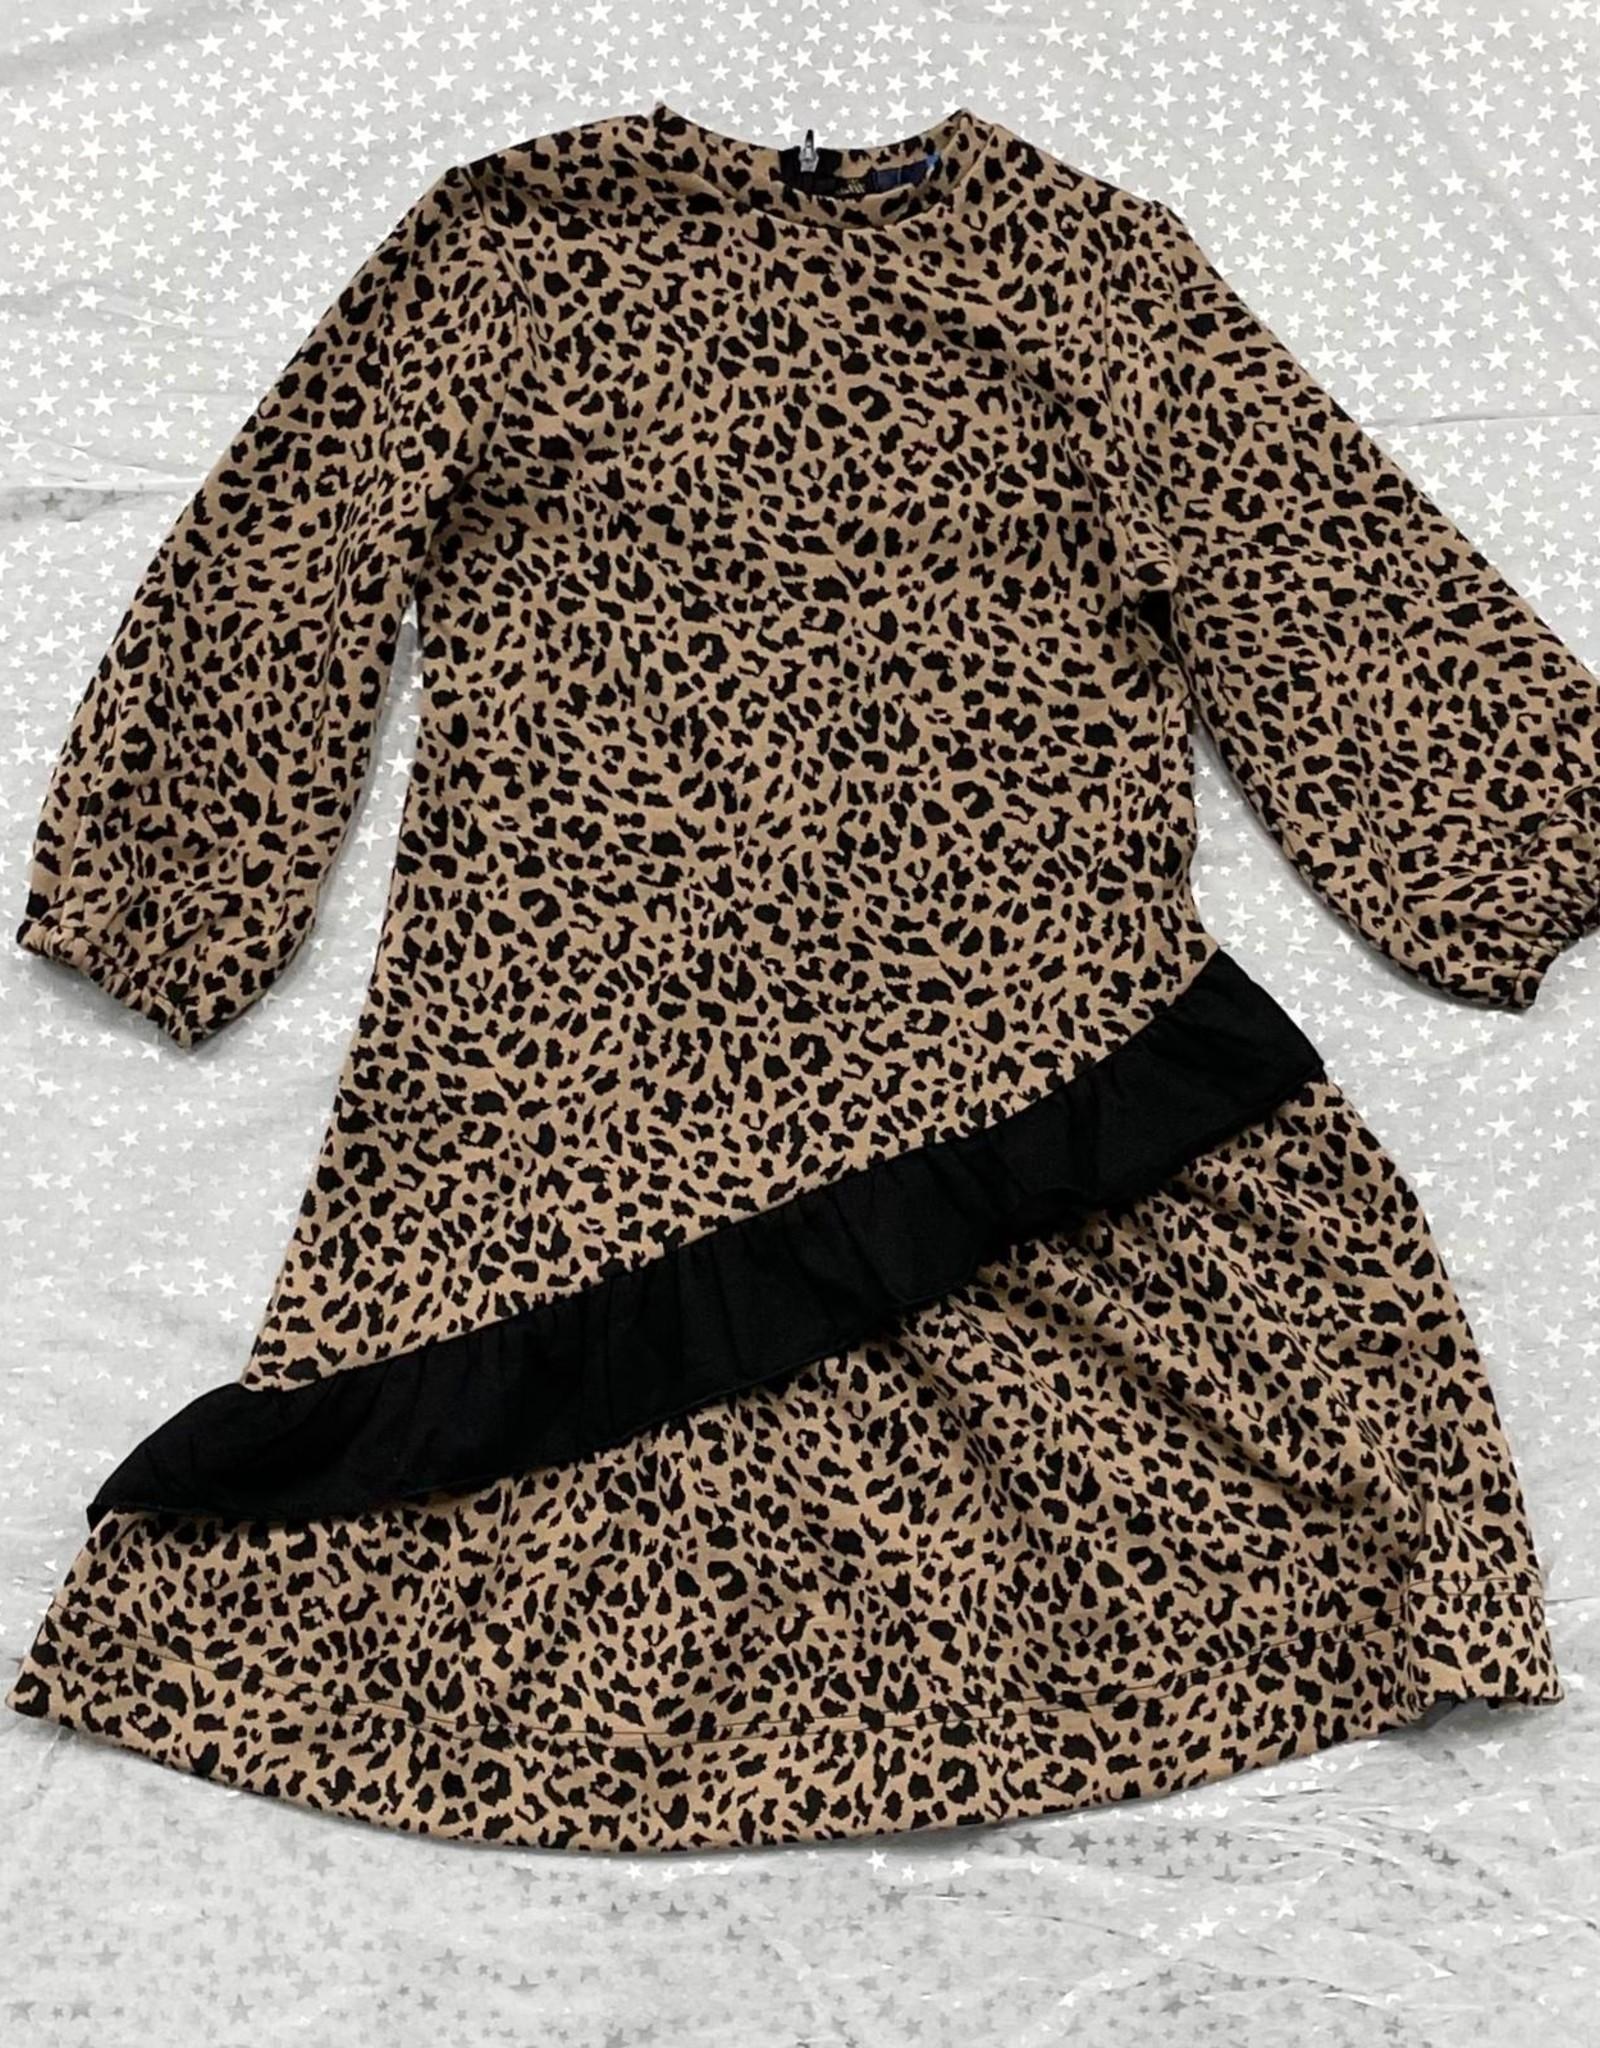 MeMe Basics MeMe Basics Leopard Dress with Asymetrical Ruffle